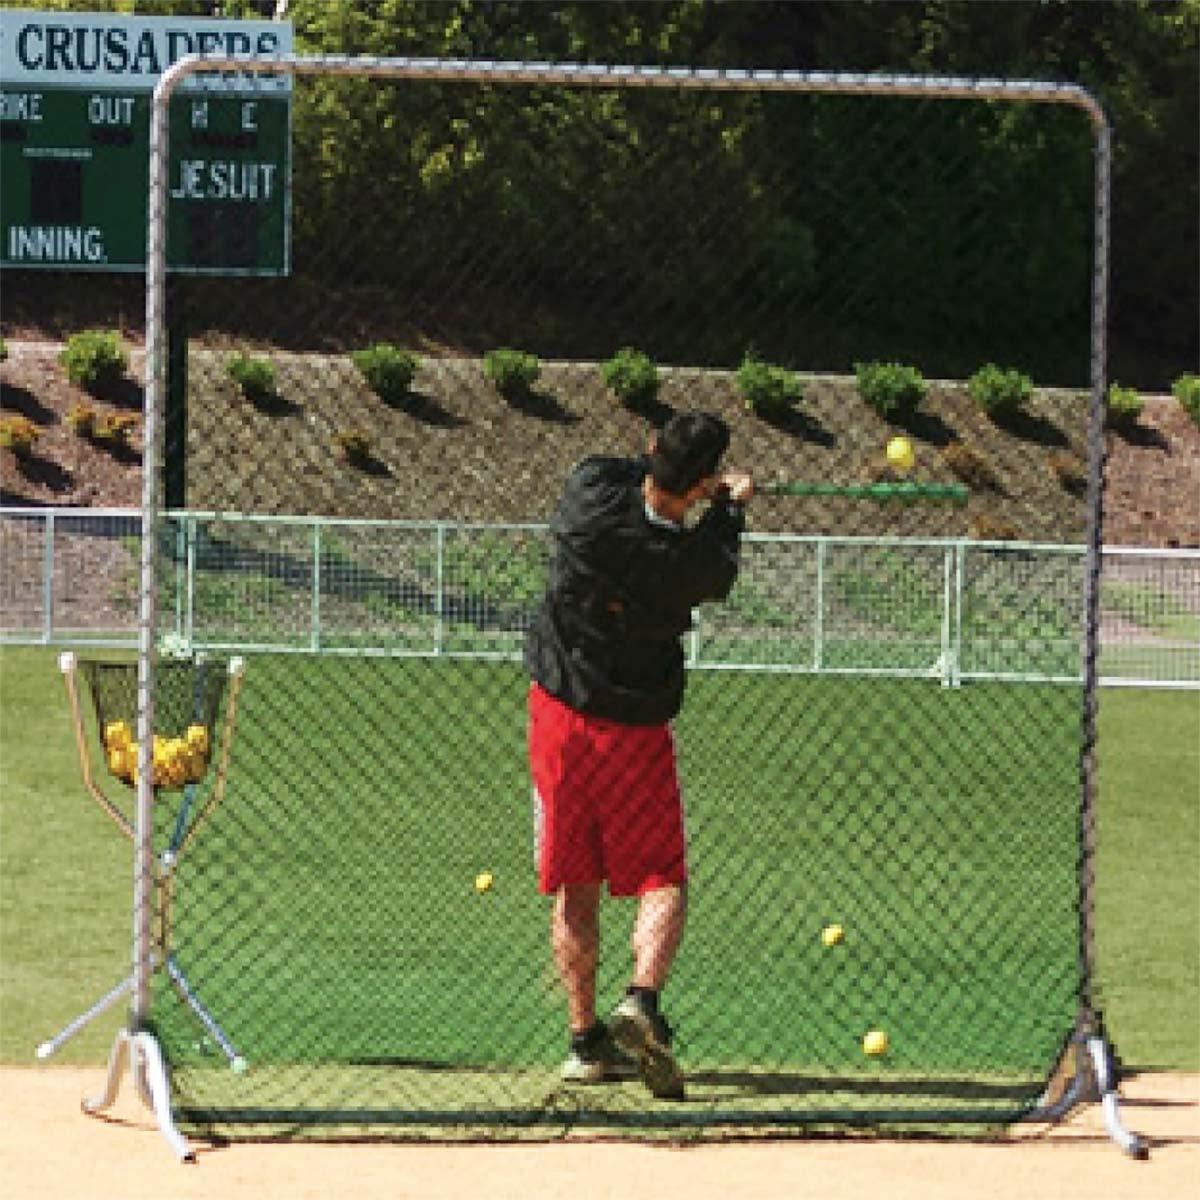 fungo pitching machine